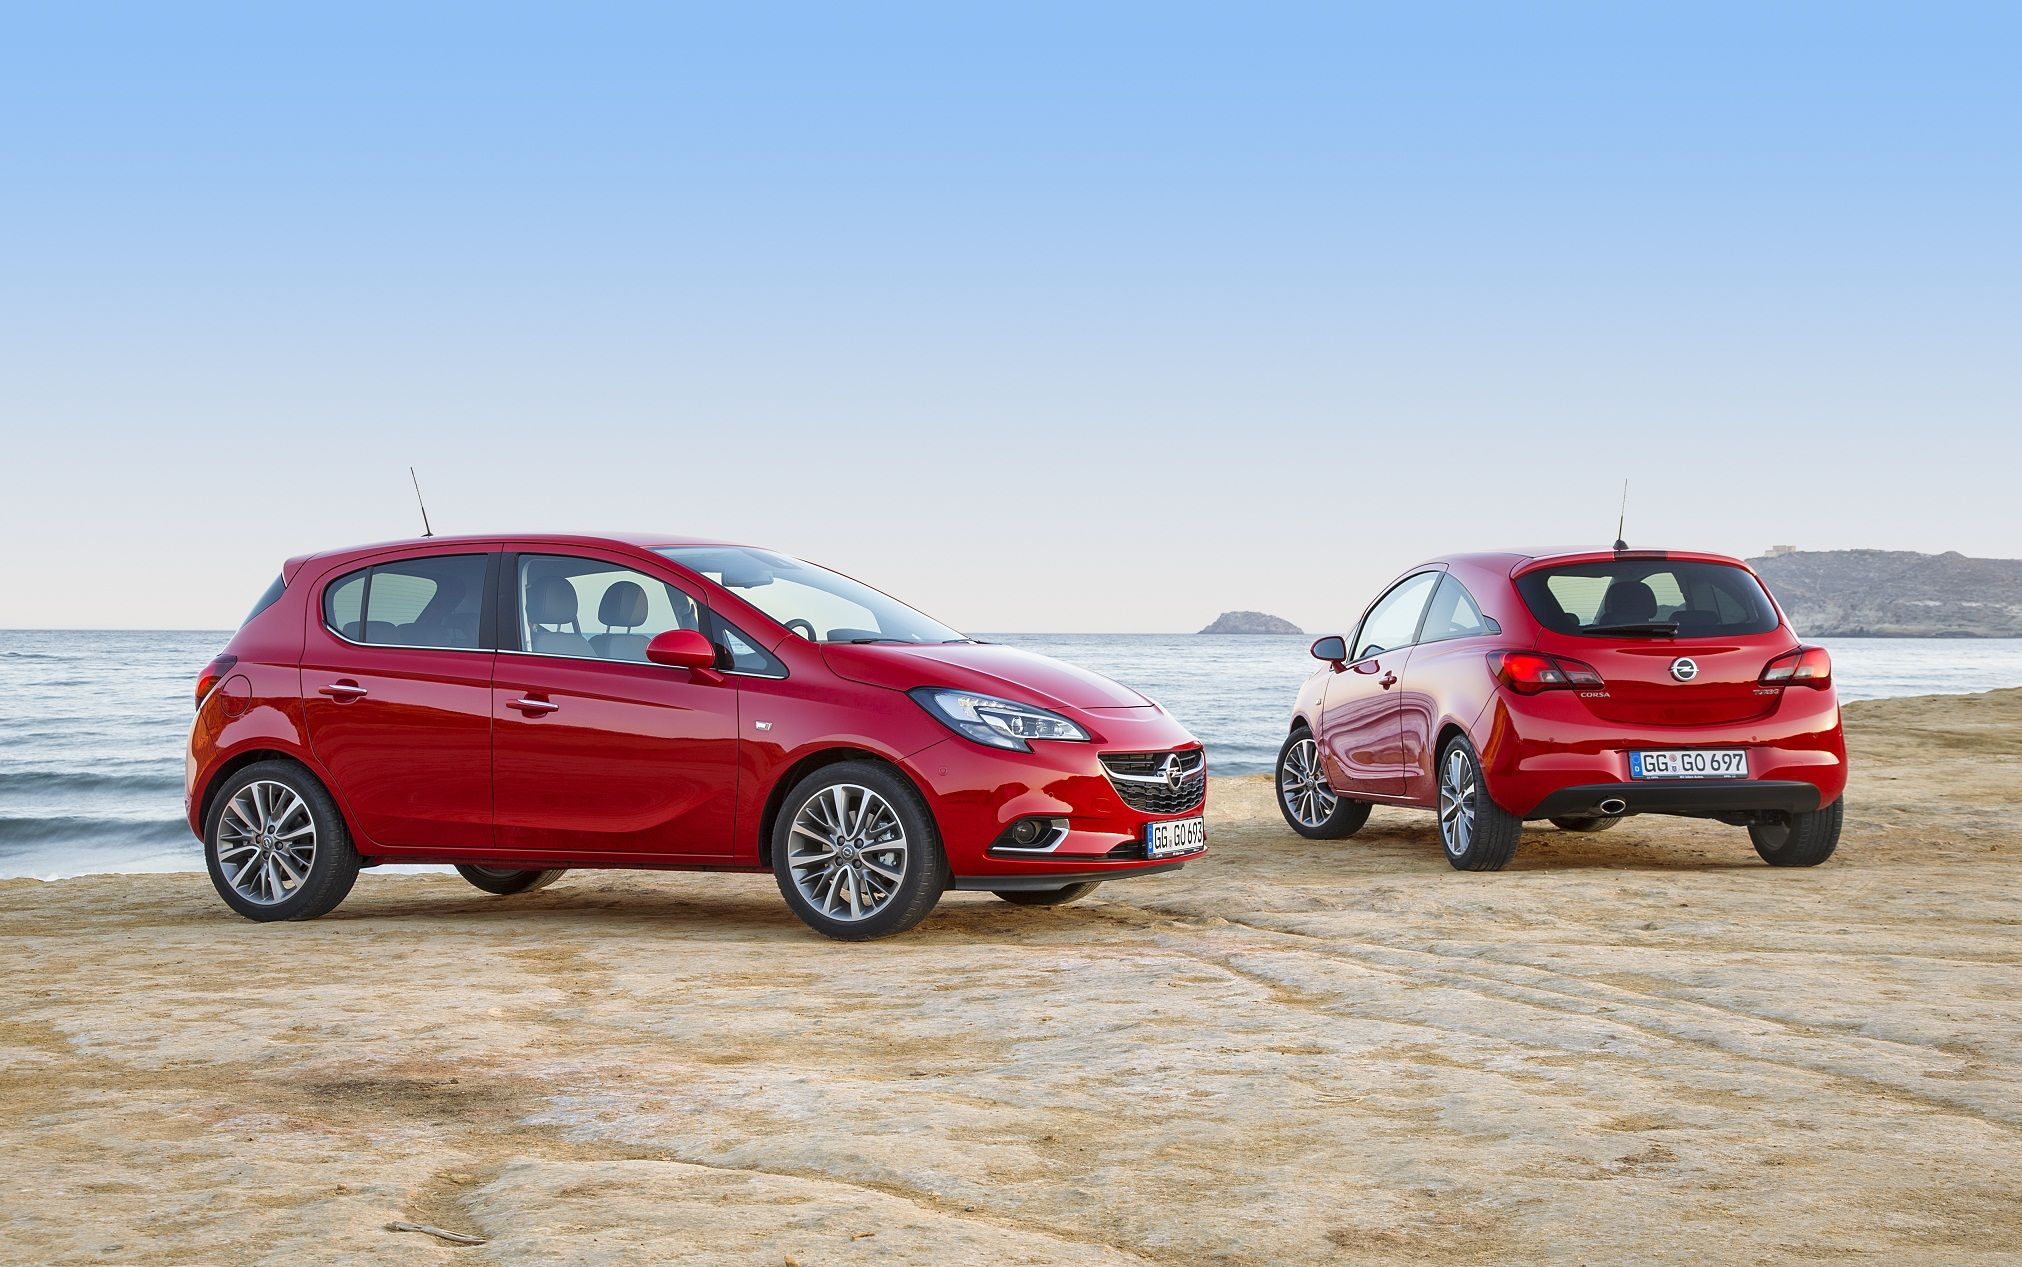 Opel Corsa, una historia de éxito